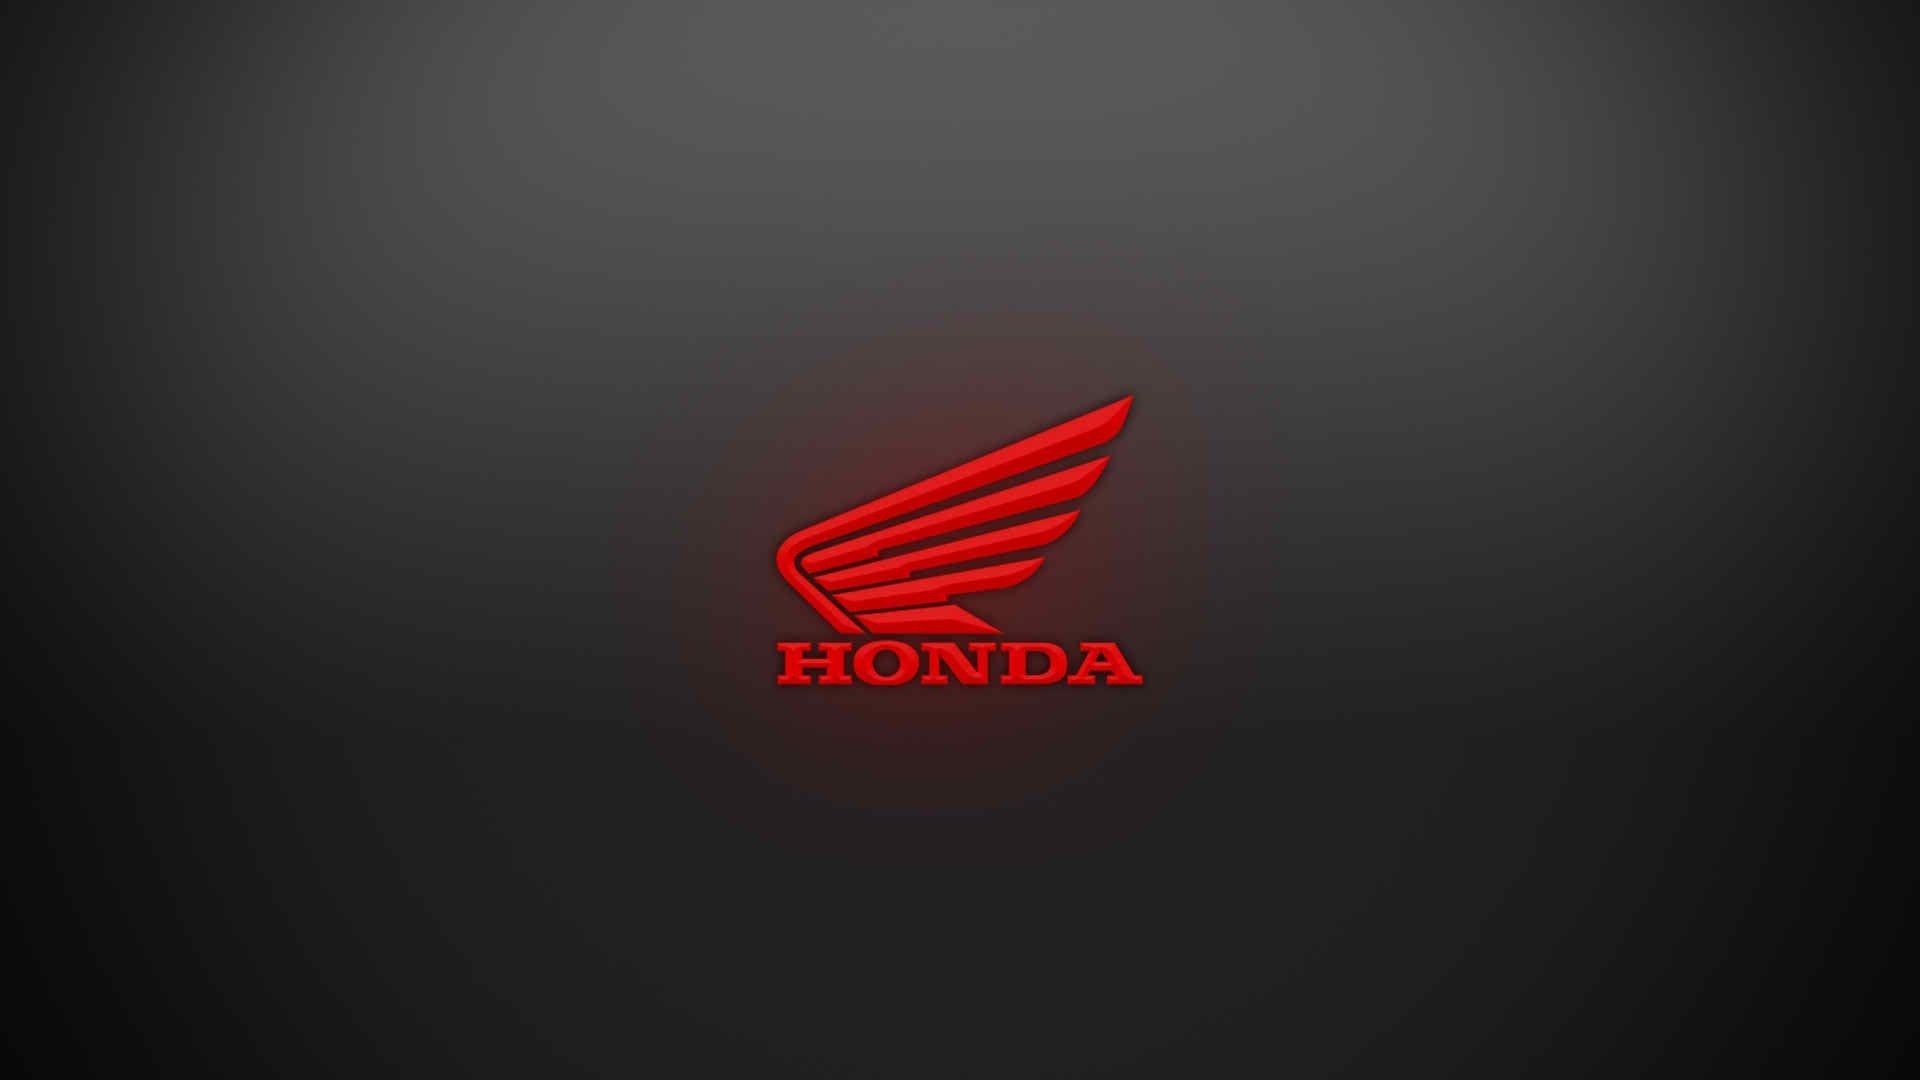 Honda Android Duvar Kağıdı